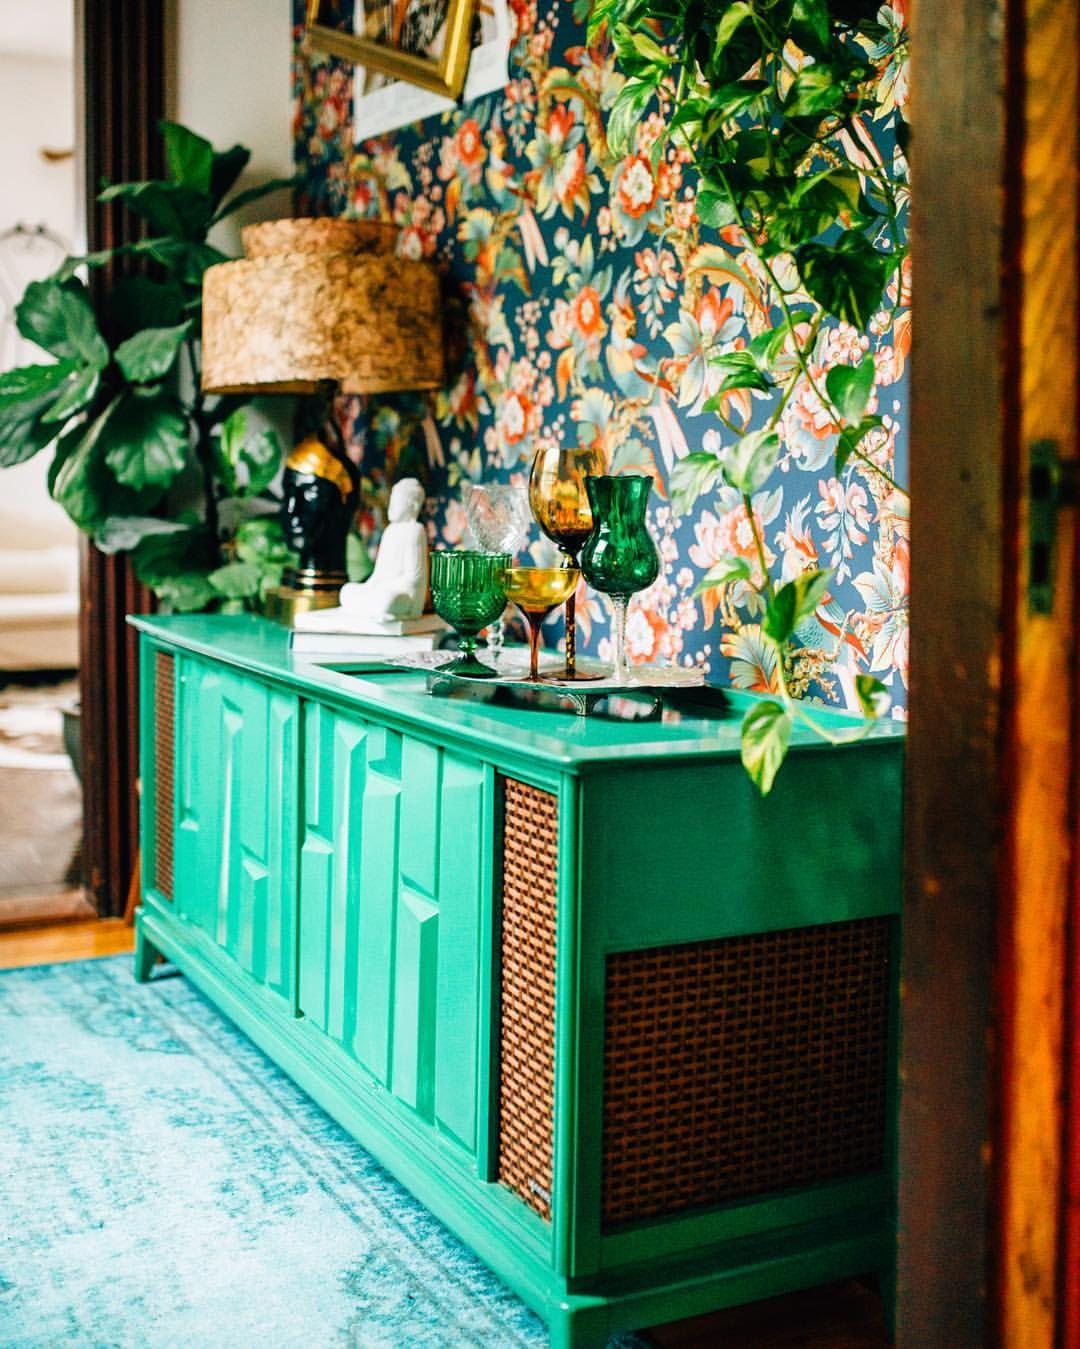 Pin by Erin H on Amazing spaces Retro home decor, Decor